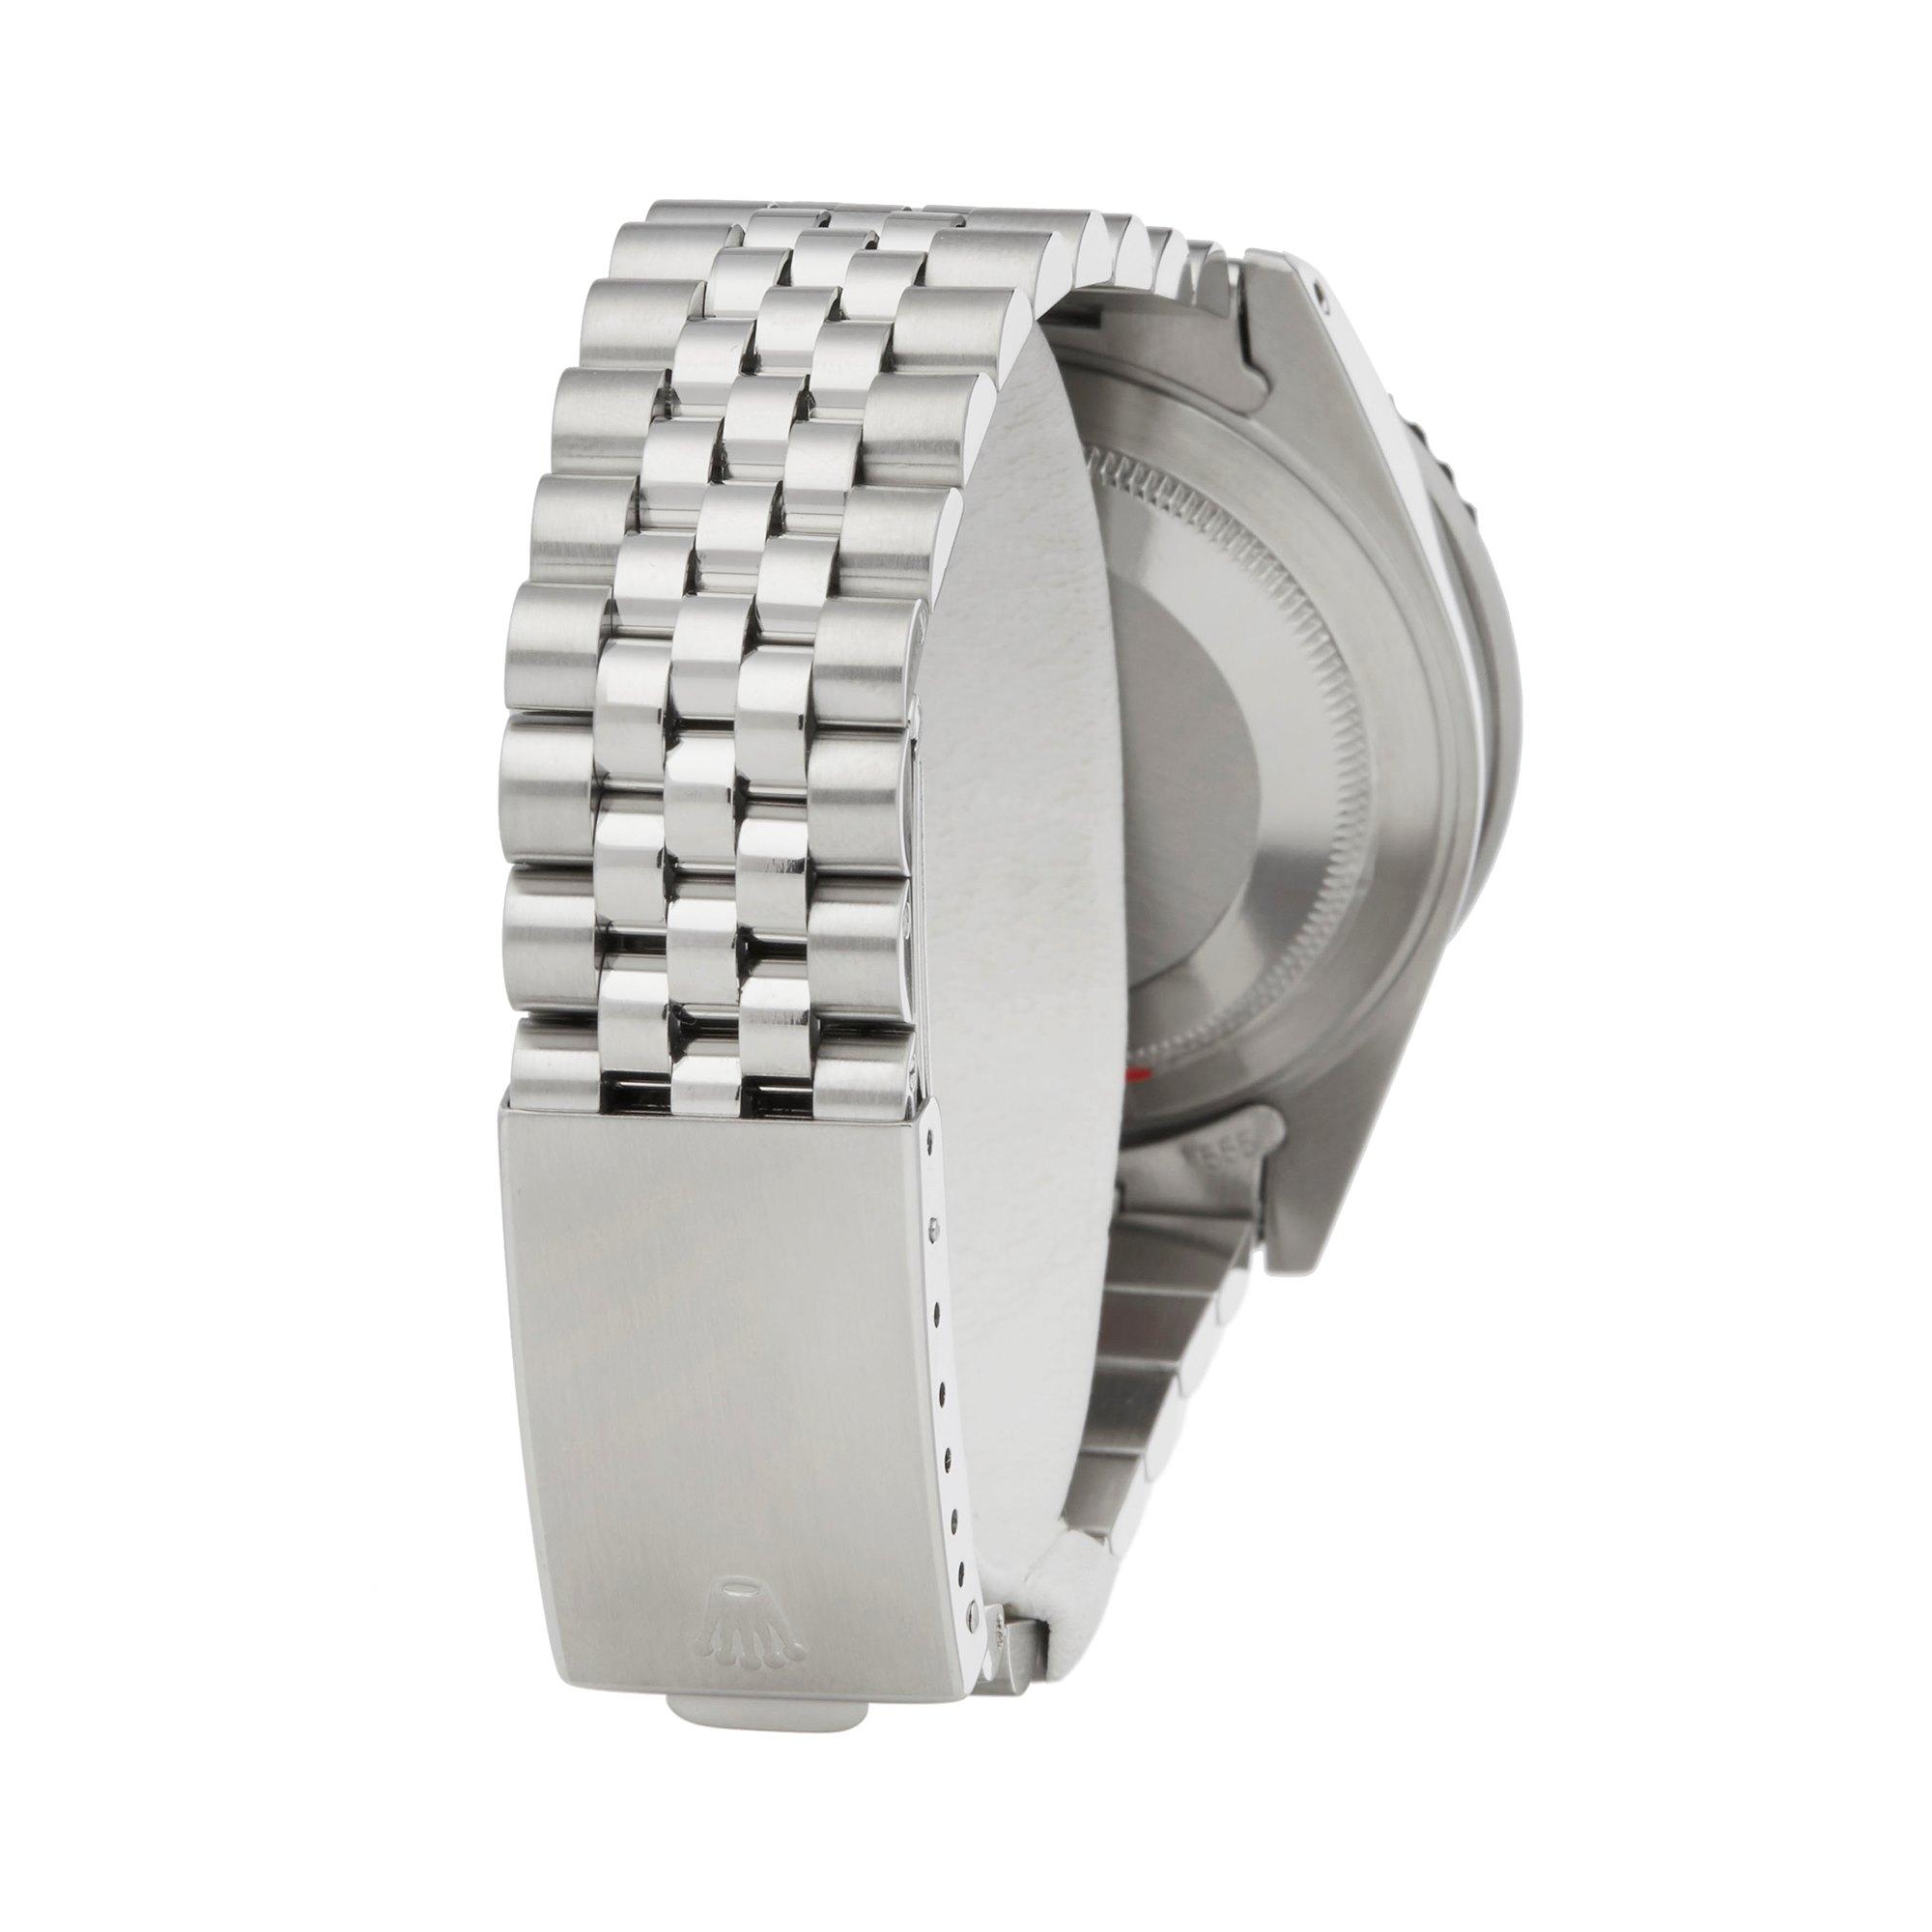 Rolex GMT-Master II Coke Stainless Steel 16710